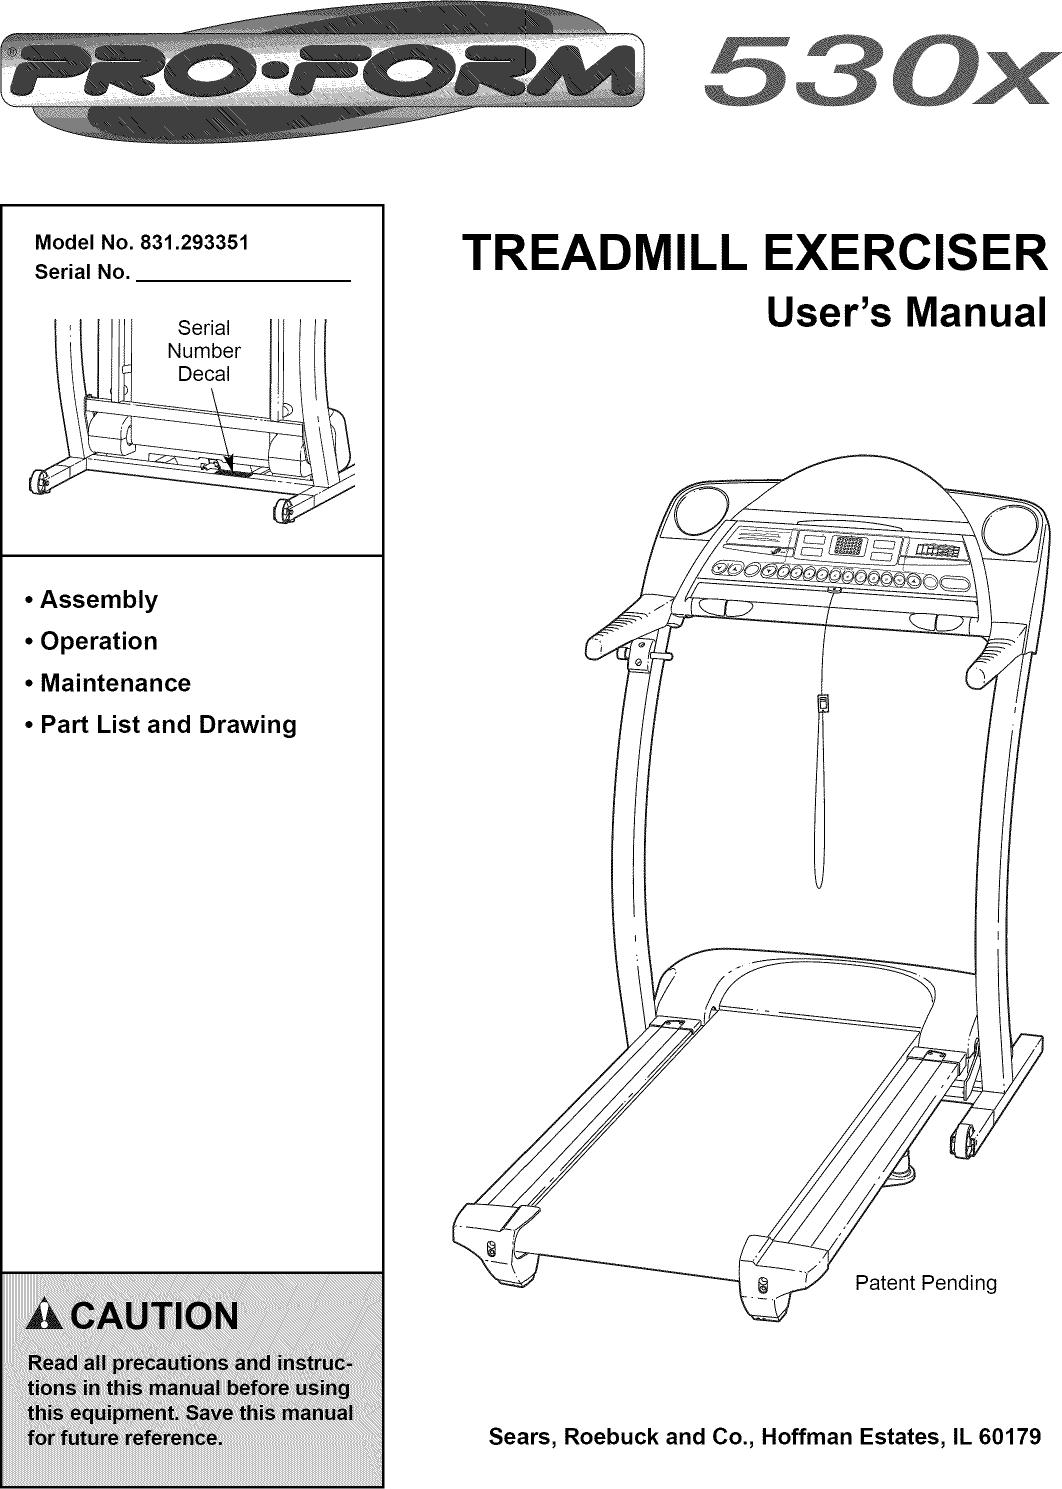 Proform 831293351 User Manual 530x Manuals And Guides L0811504 Treadmill Wiring Diagram